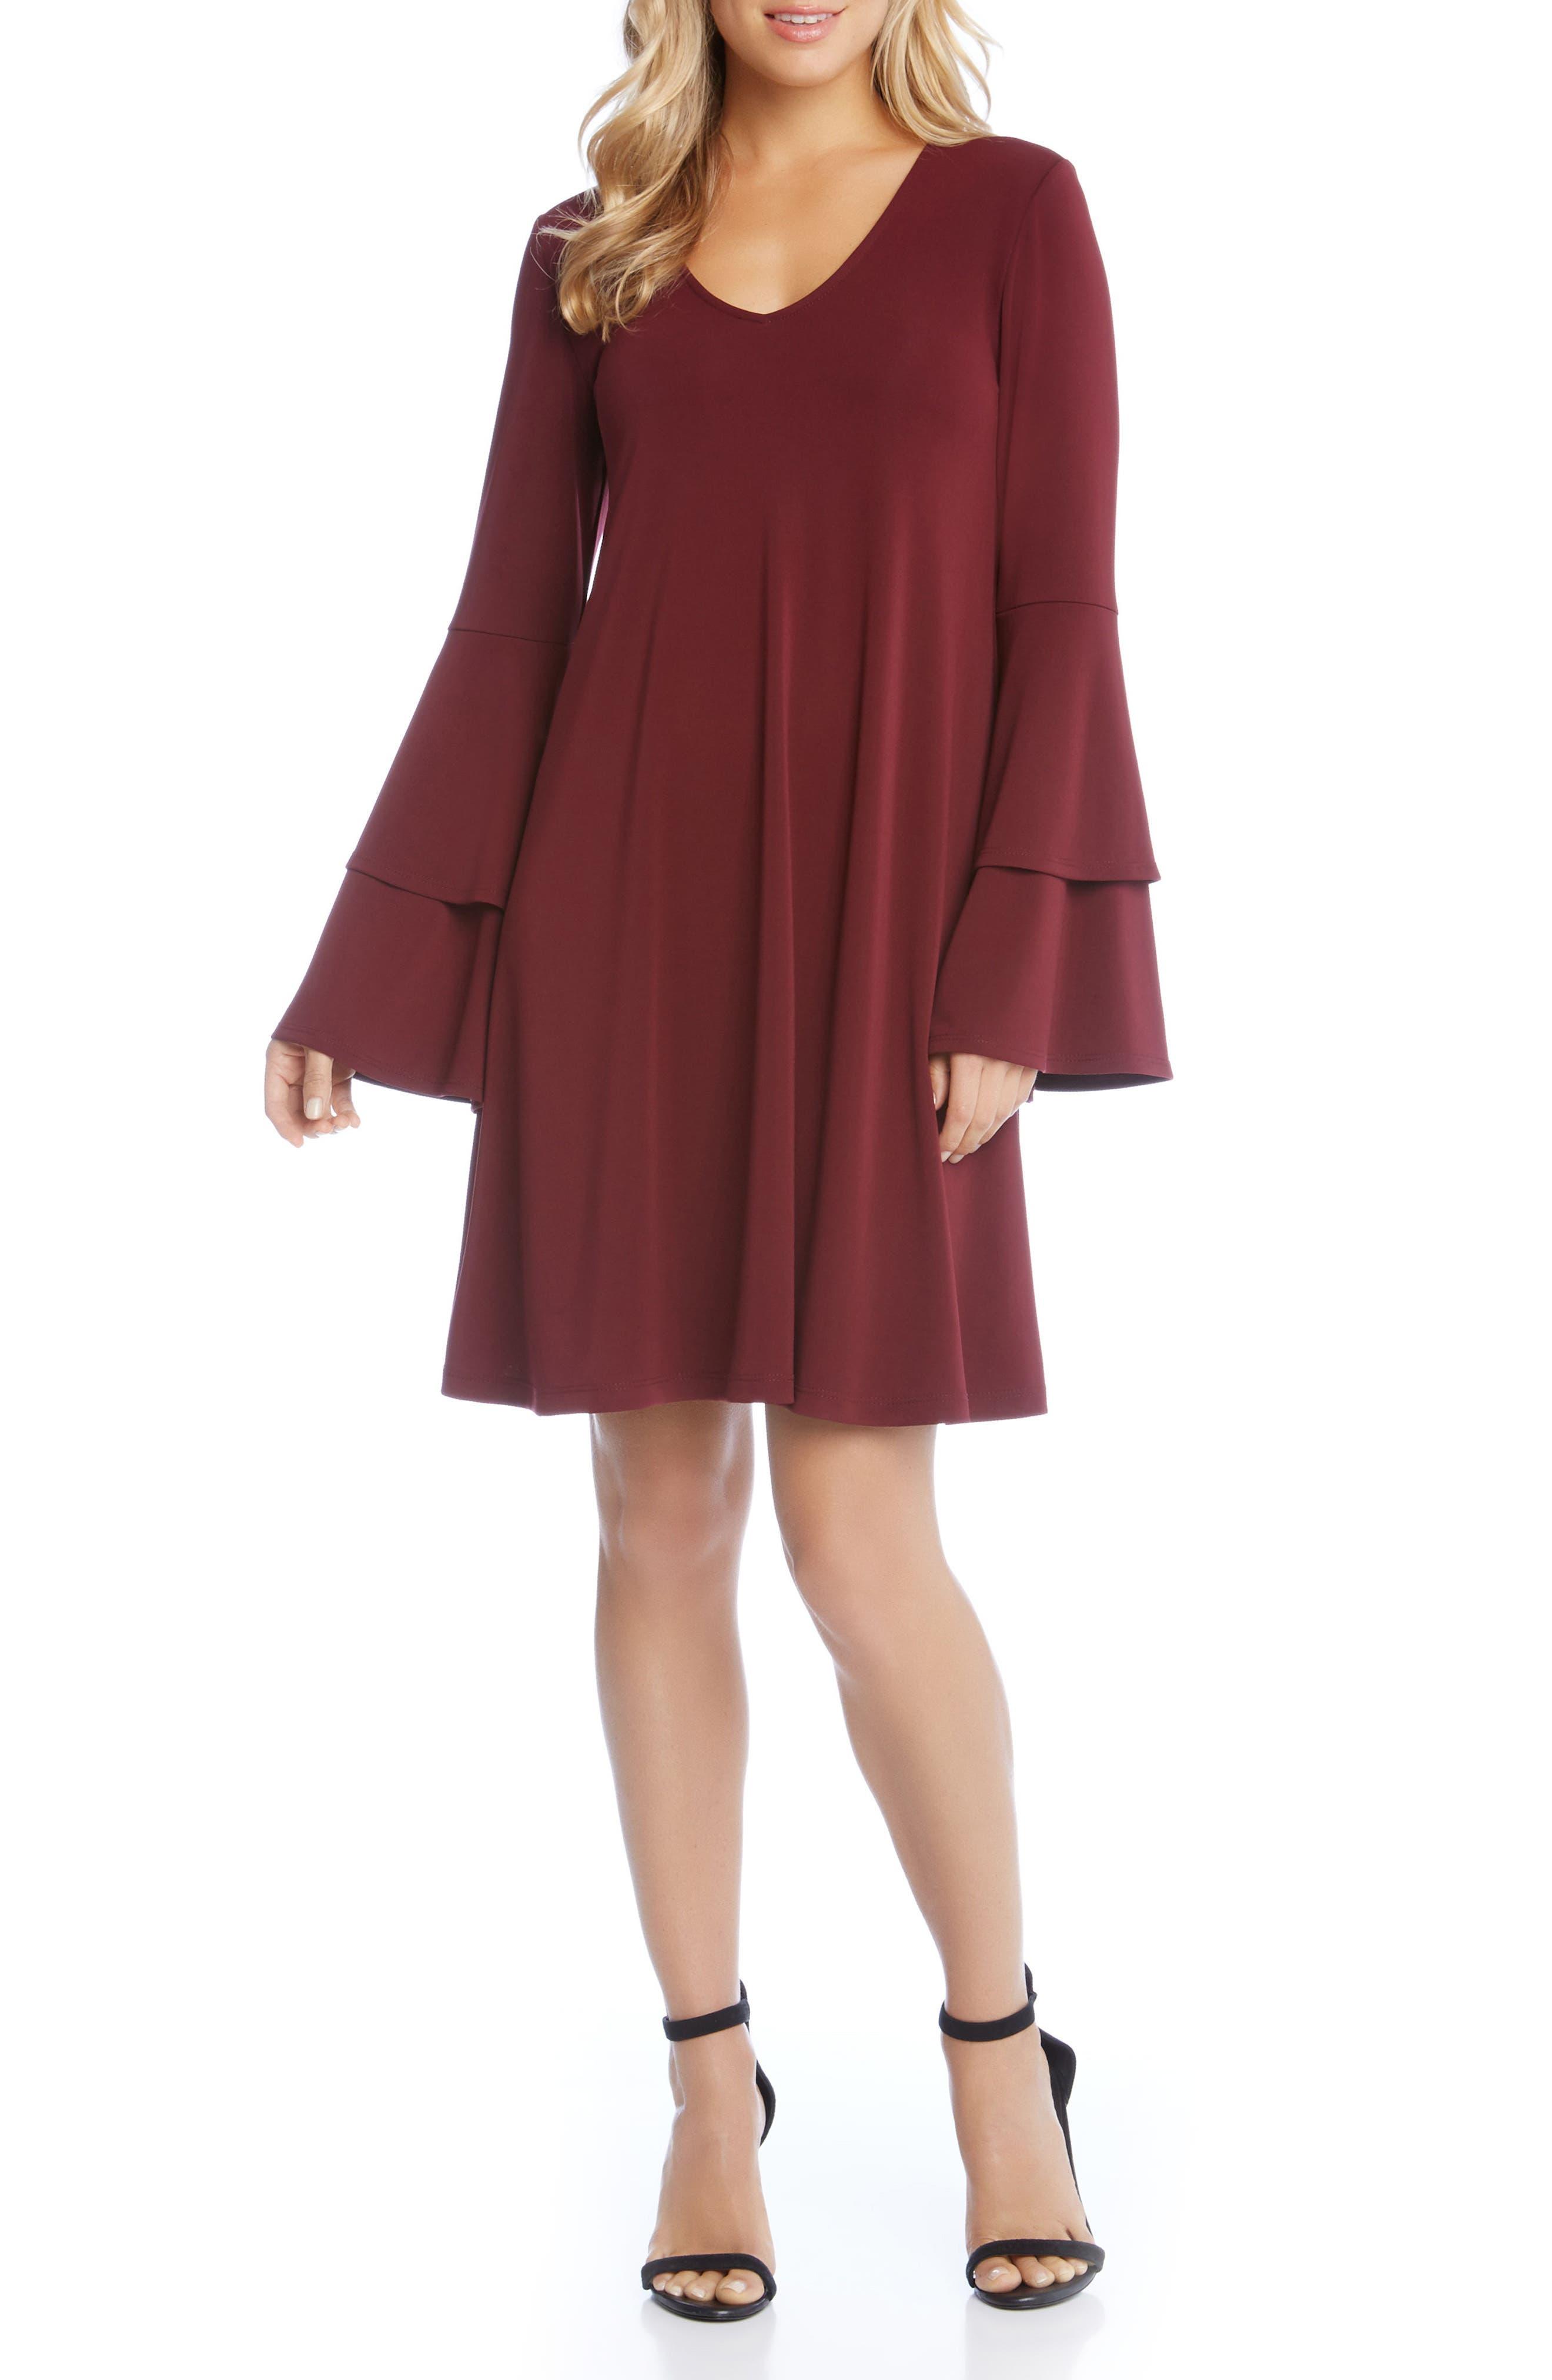 Alternate Image 1 Selected - Karen Kane Tiered Bell Sleeve A-Line Dress